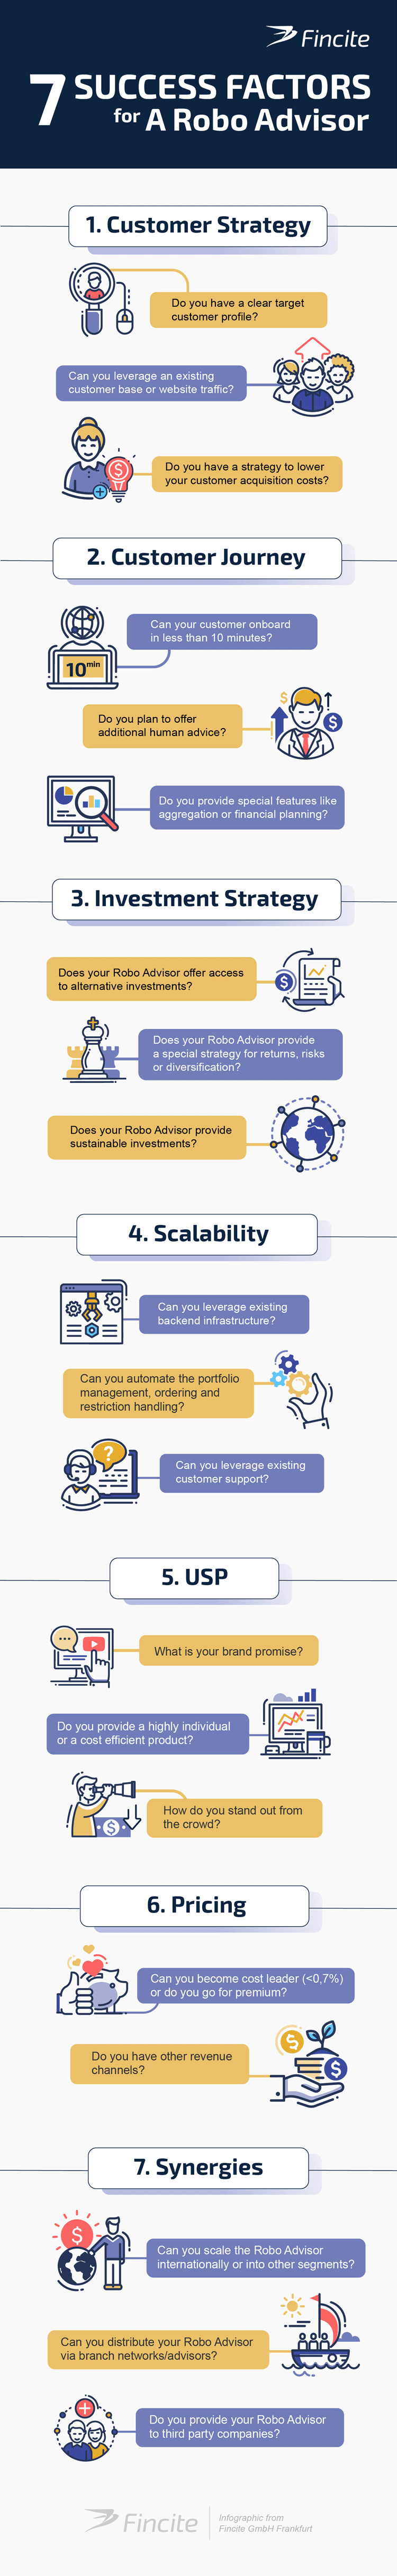 Infografik: Sieben Erfolgsfaktoren für einen Robo Advisor